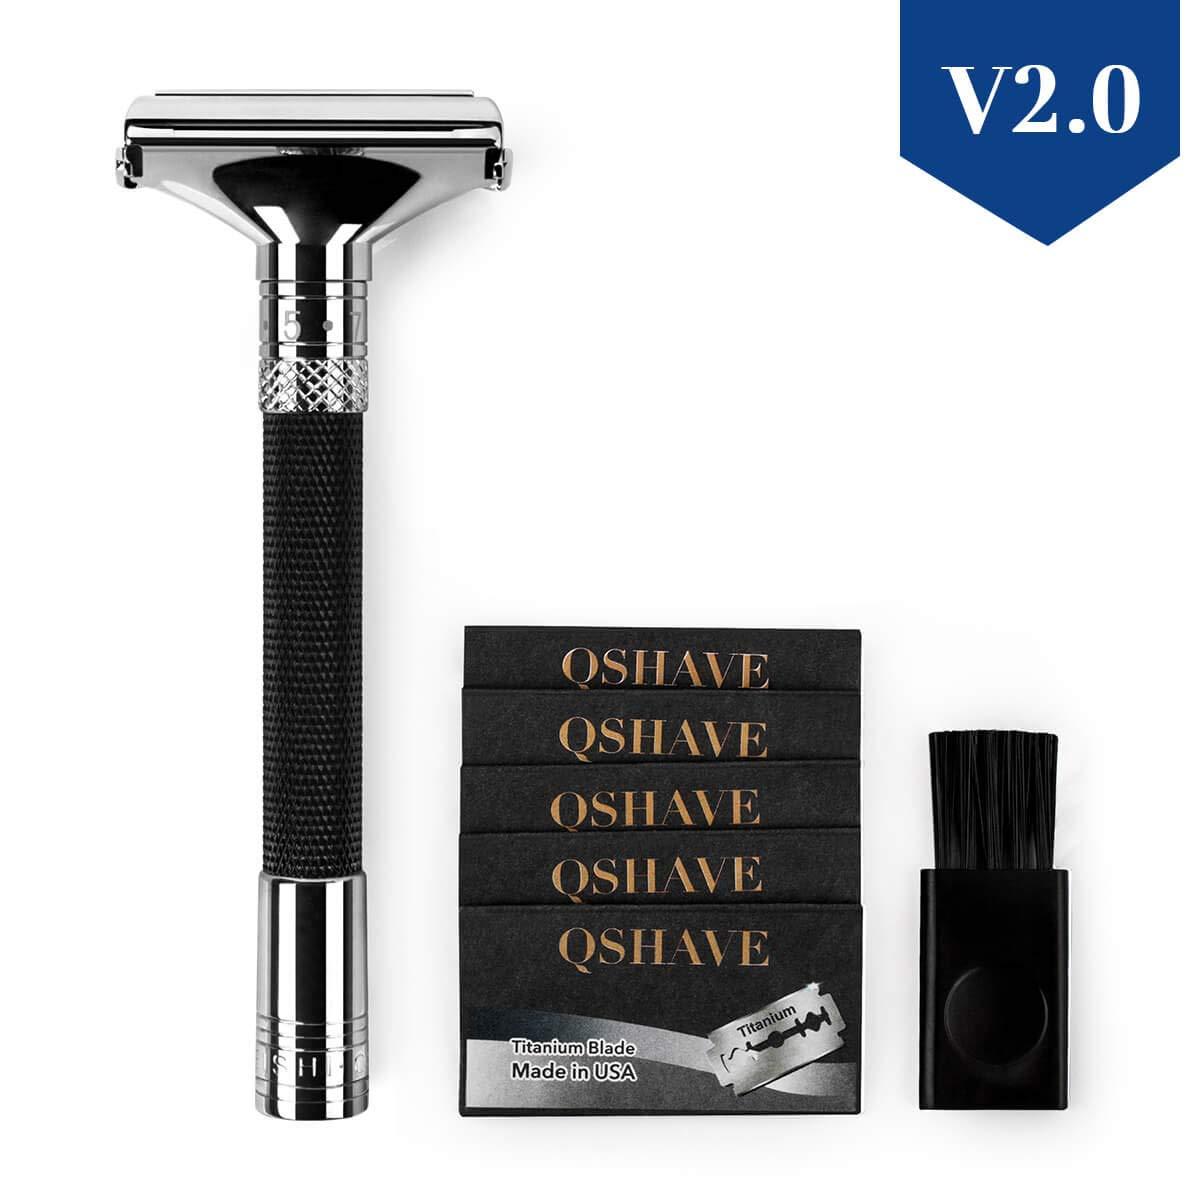 QSHAVE Parthenon Razor V2.0, 9 Degrees Adjustable Double Edge Safety Razor (Black)